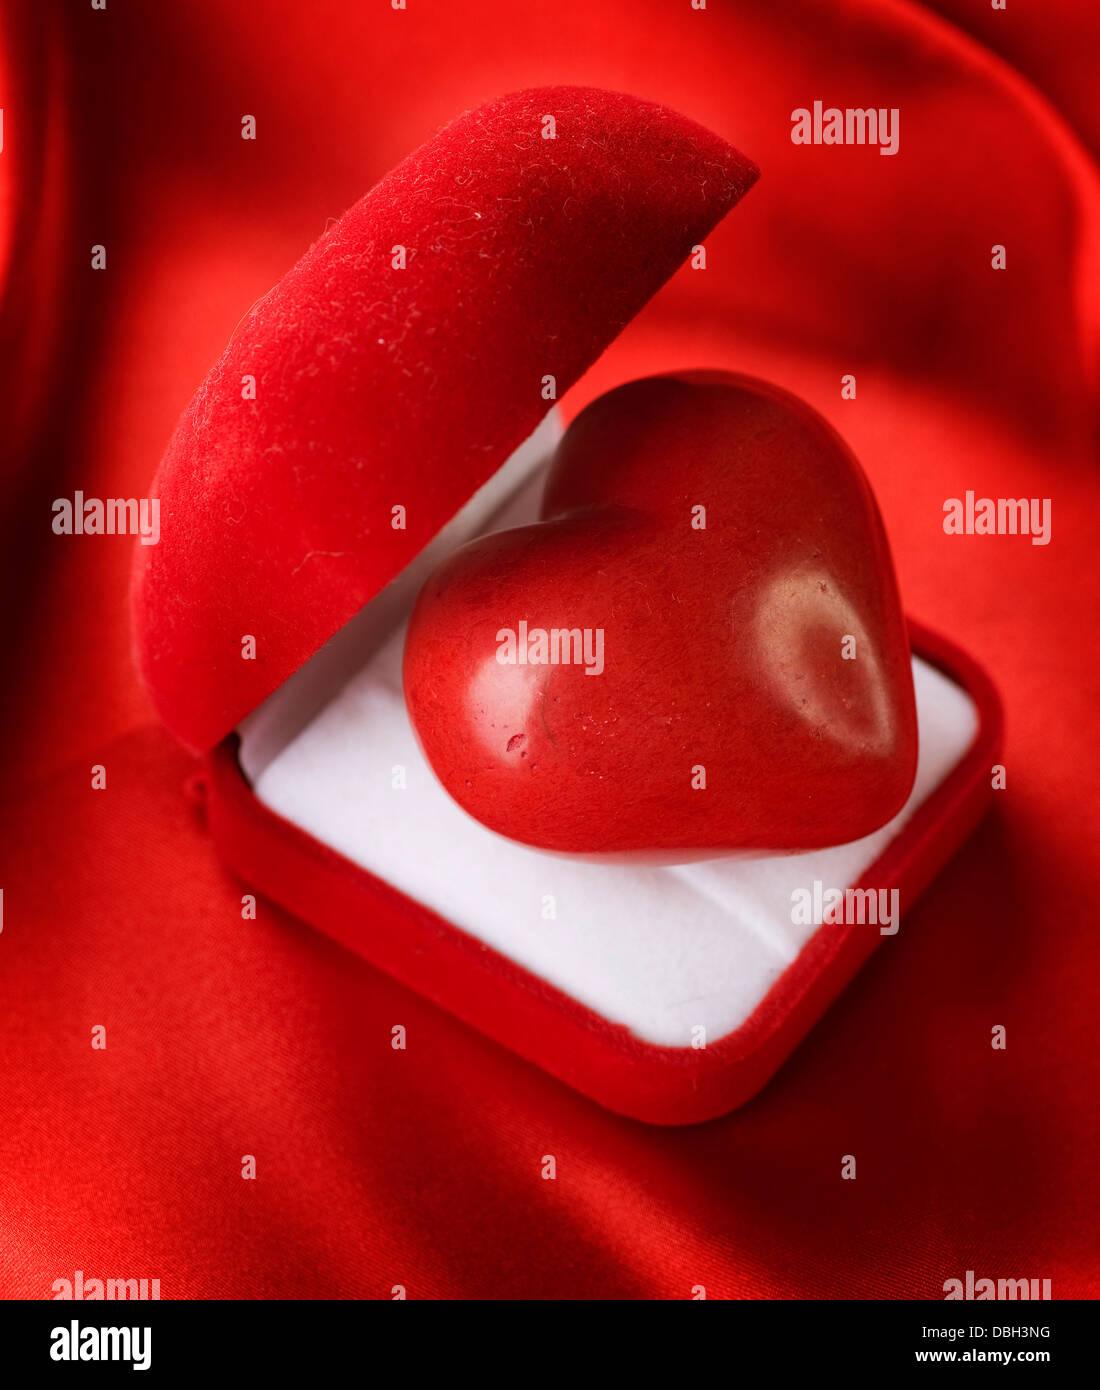 Concepto de San Valentín. Caja de regalo de terciopelo rojo con un corazón Imagen De Stock